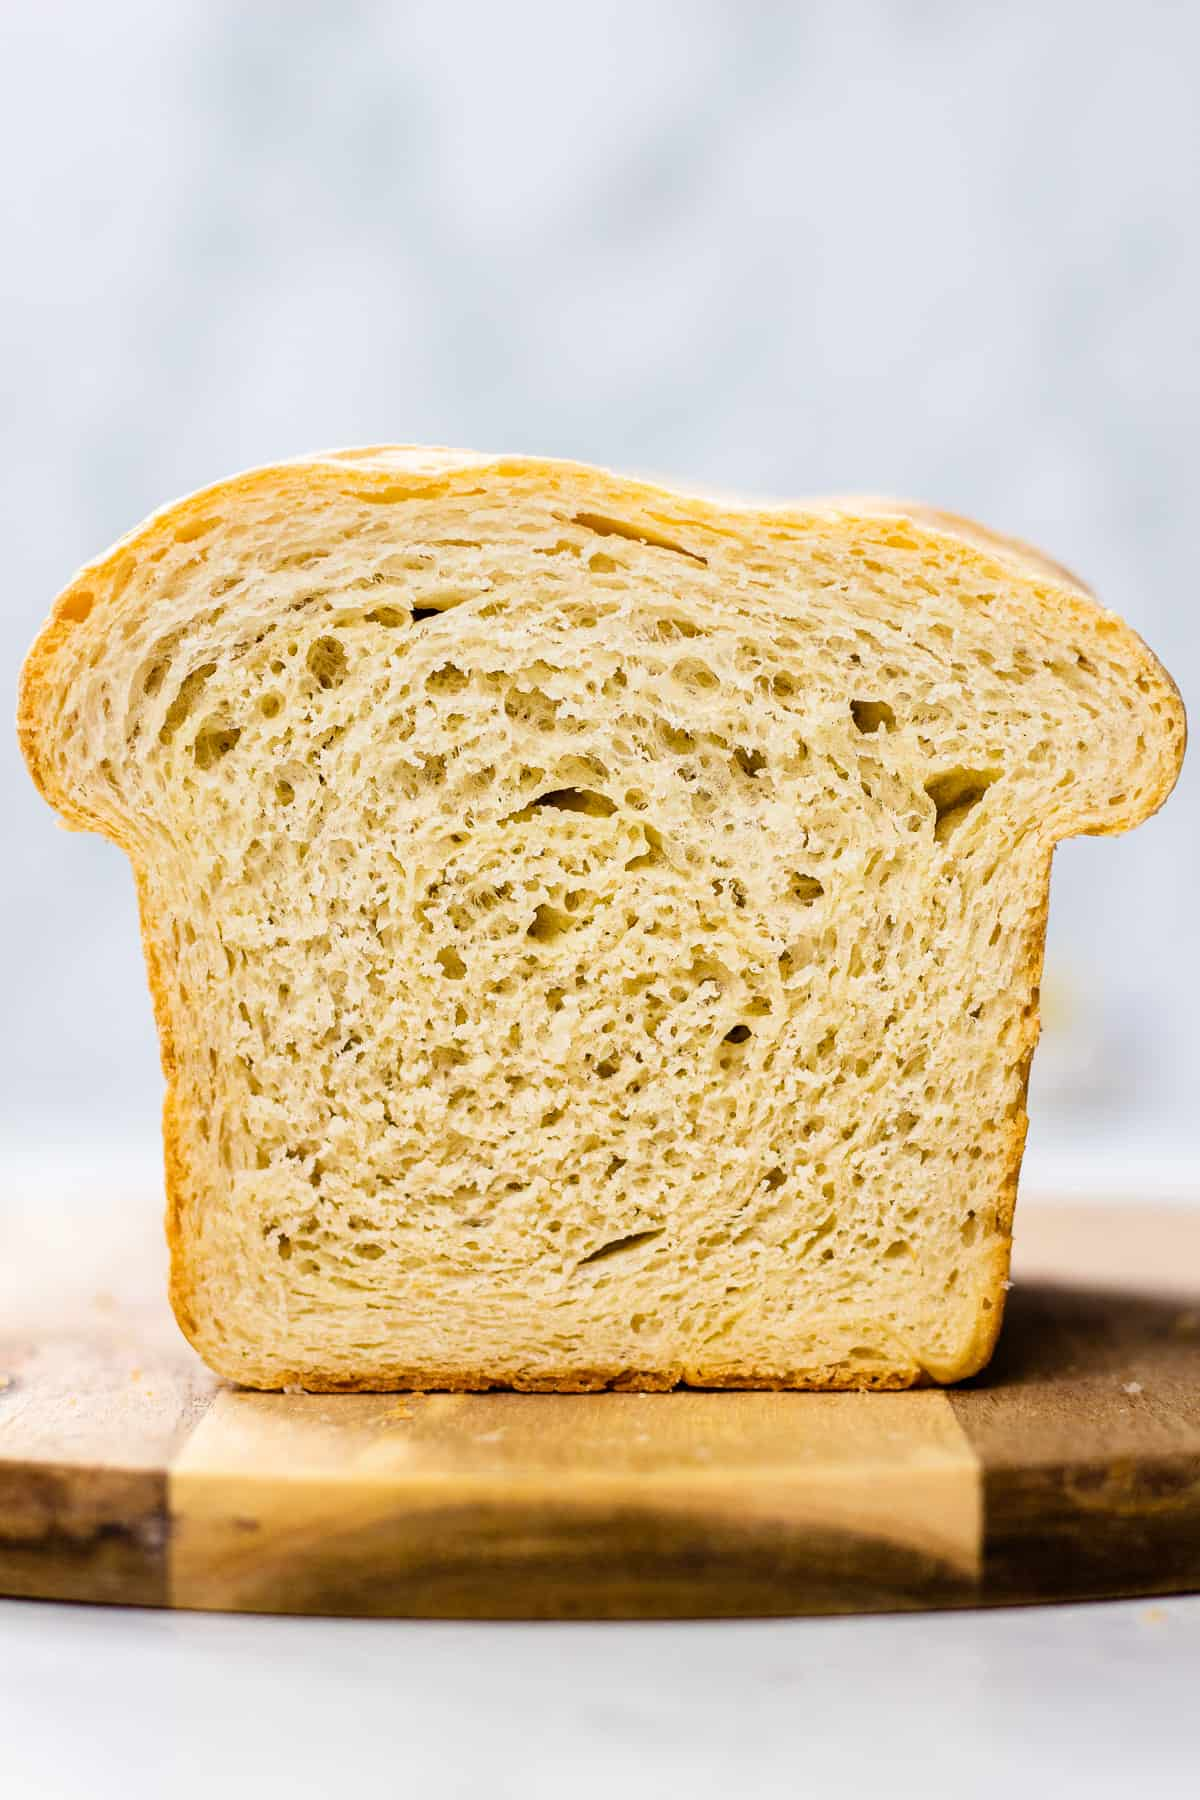 A close up photo of a cut white sandwich bread.